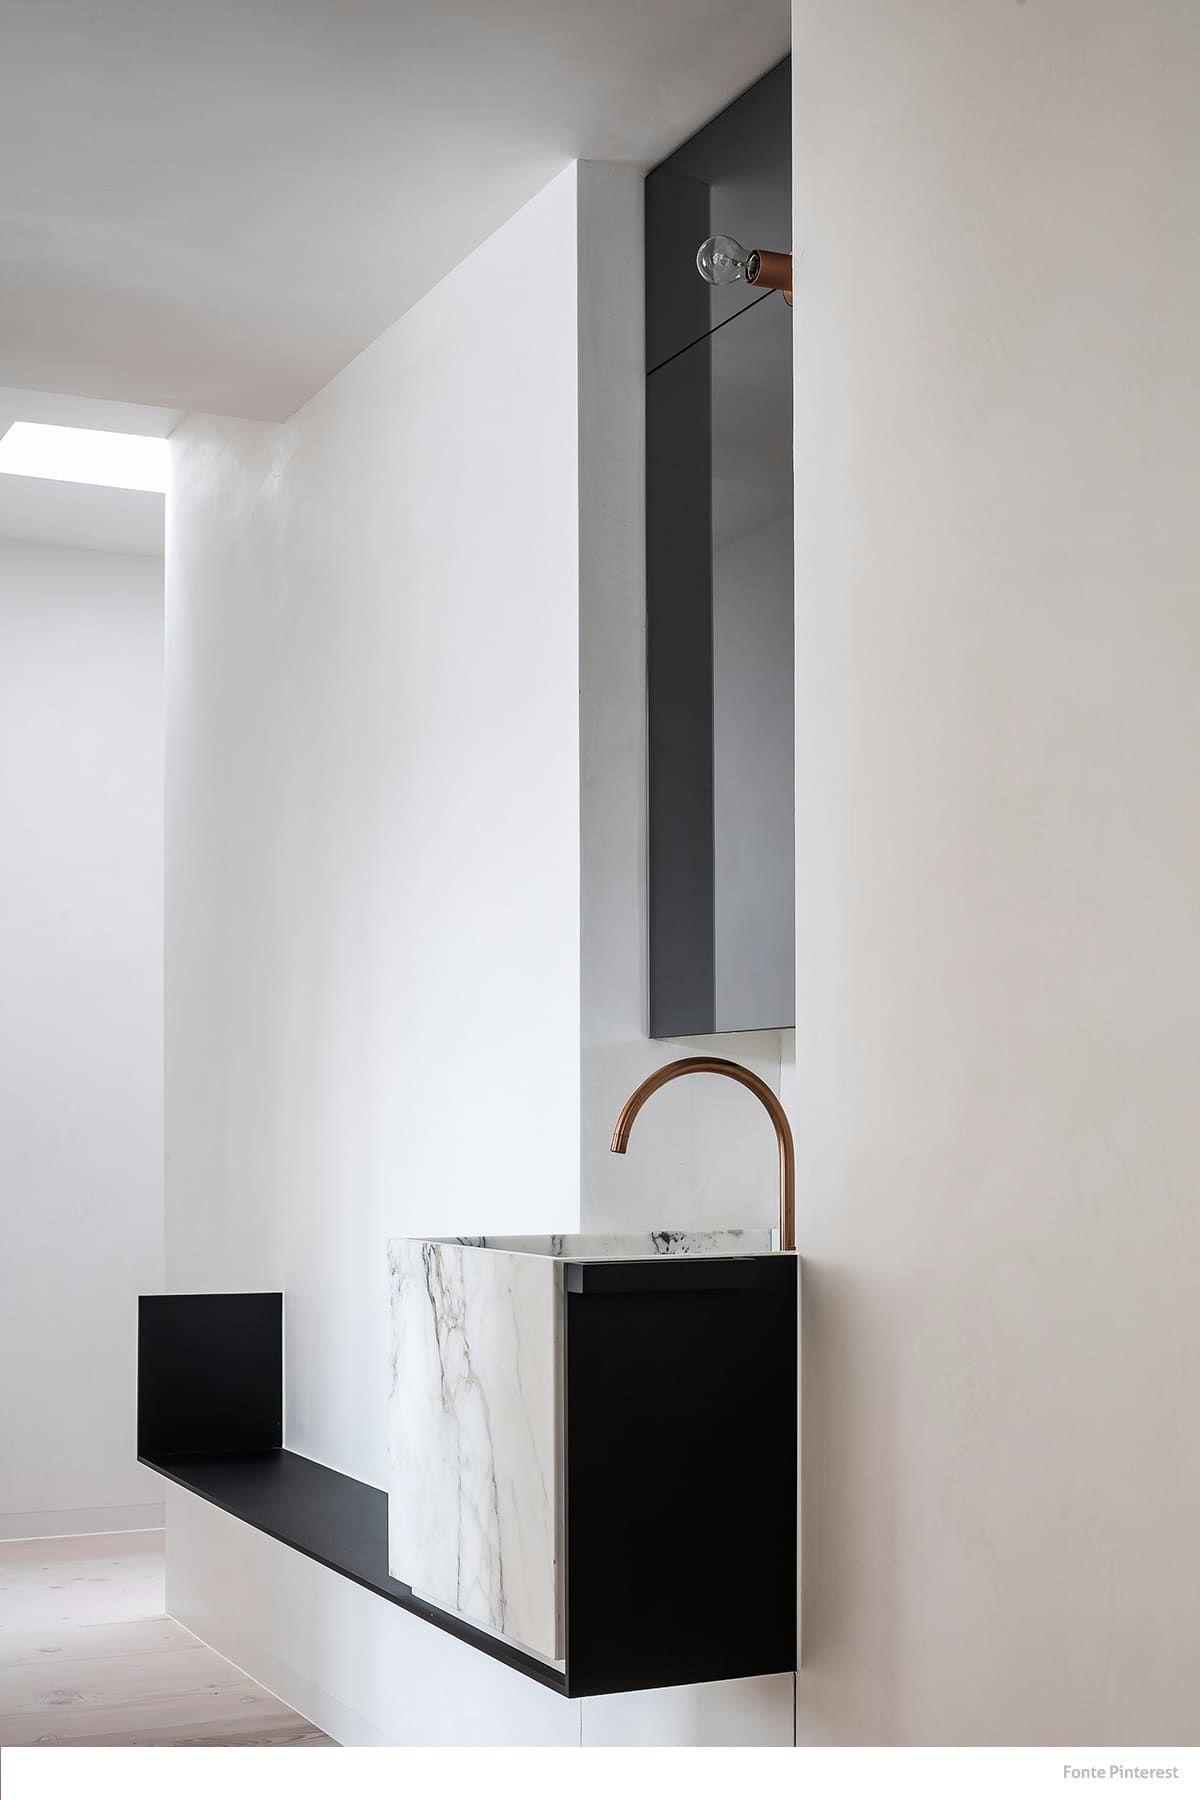 Bagni Moderni In Marmo.Bagni Moderni In Marmo Bathroom In 2019 Minimalist Bathroom